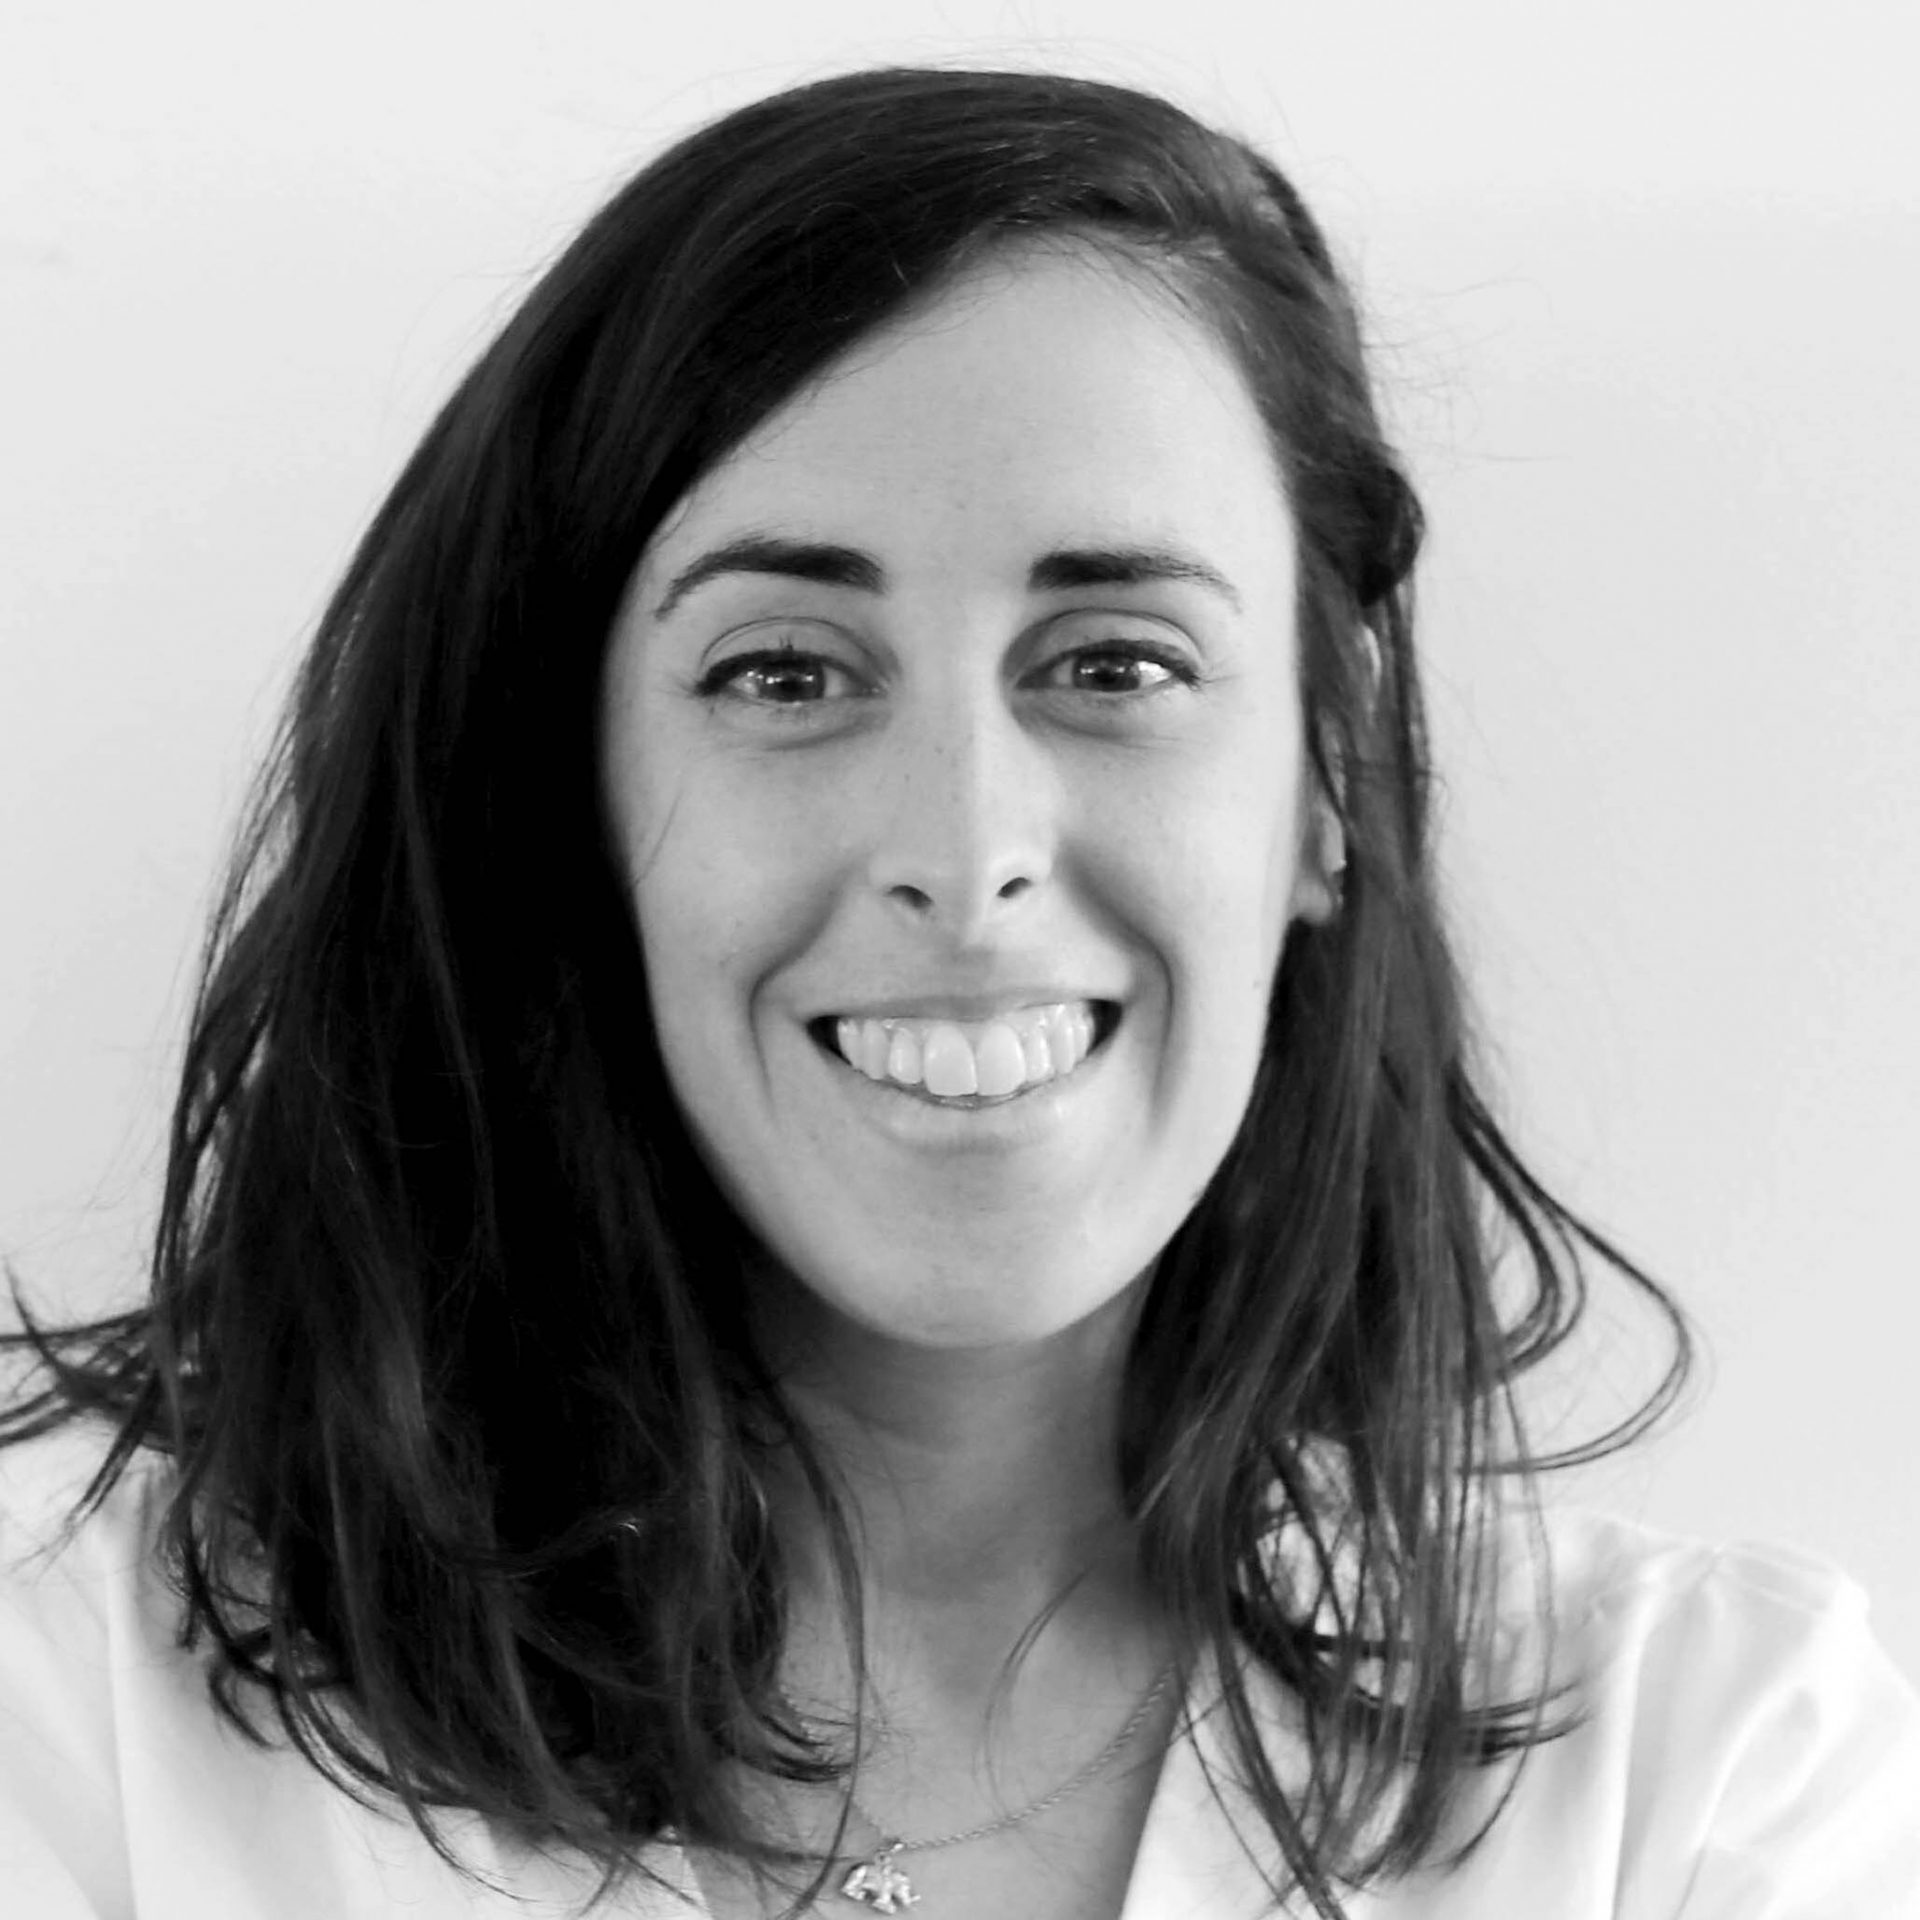 http://staging.ksrarchitects.com/wp-content/uploads/2020/12/Paula-Benitez-Ruiz-scaled.jpg